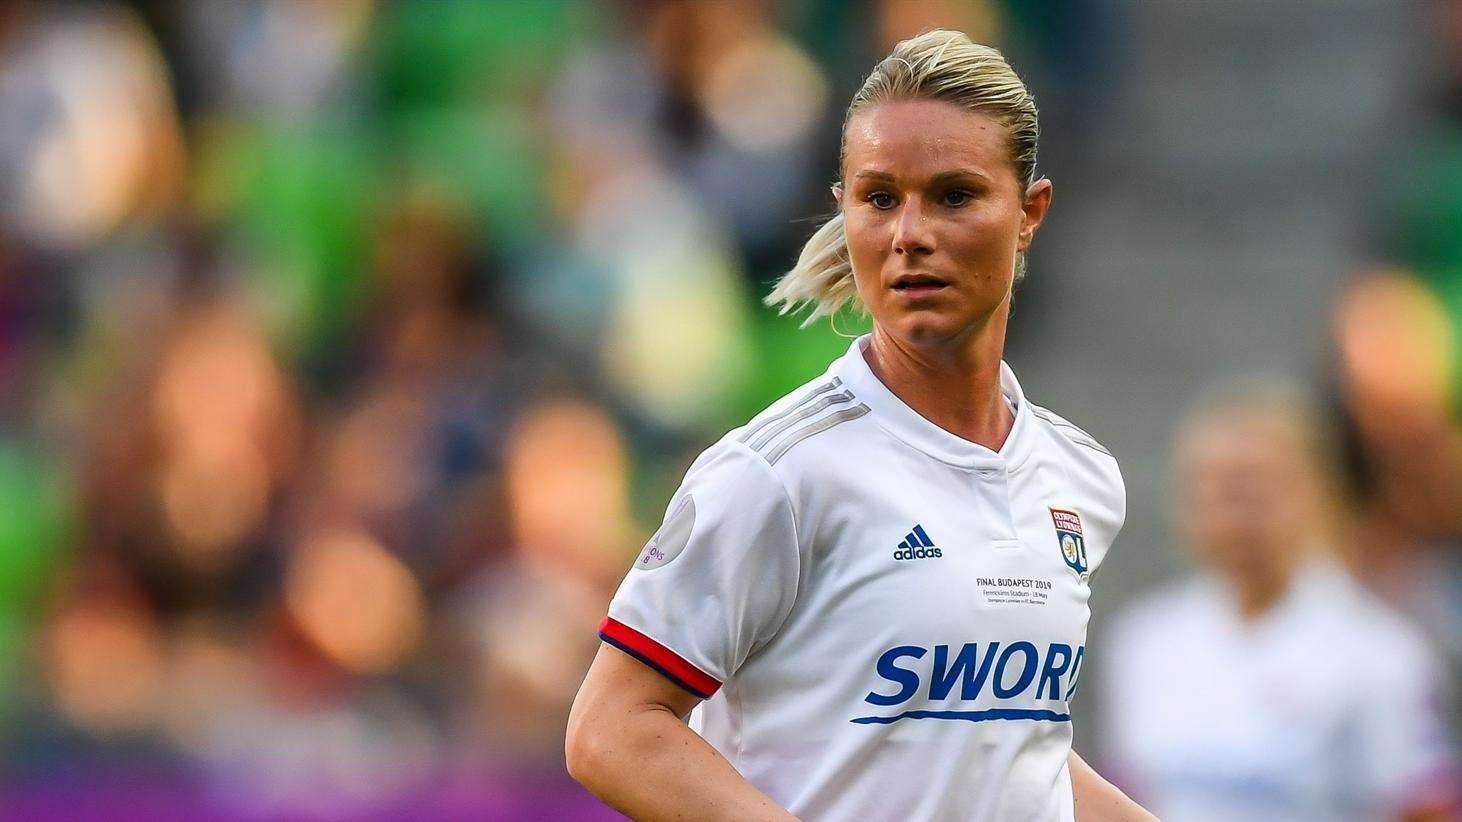 Uefa Women S Player Of The Year Nominee Amandine Henry Uefa Women S Champions League Uefa Com